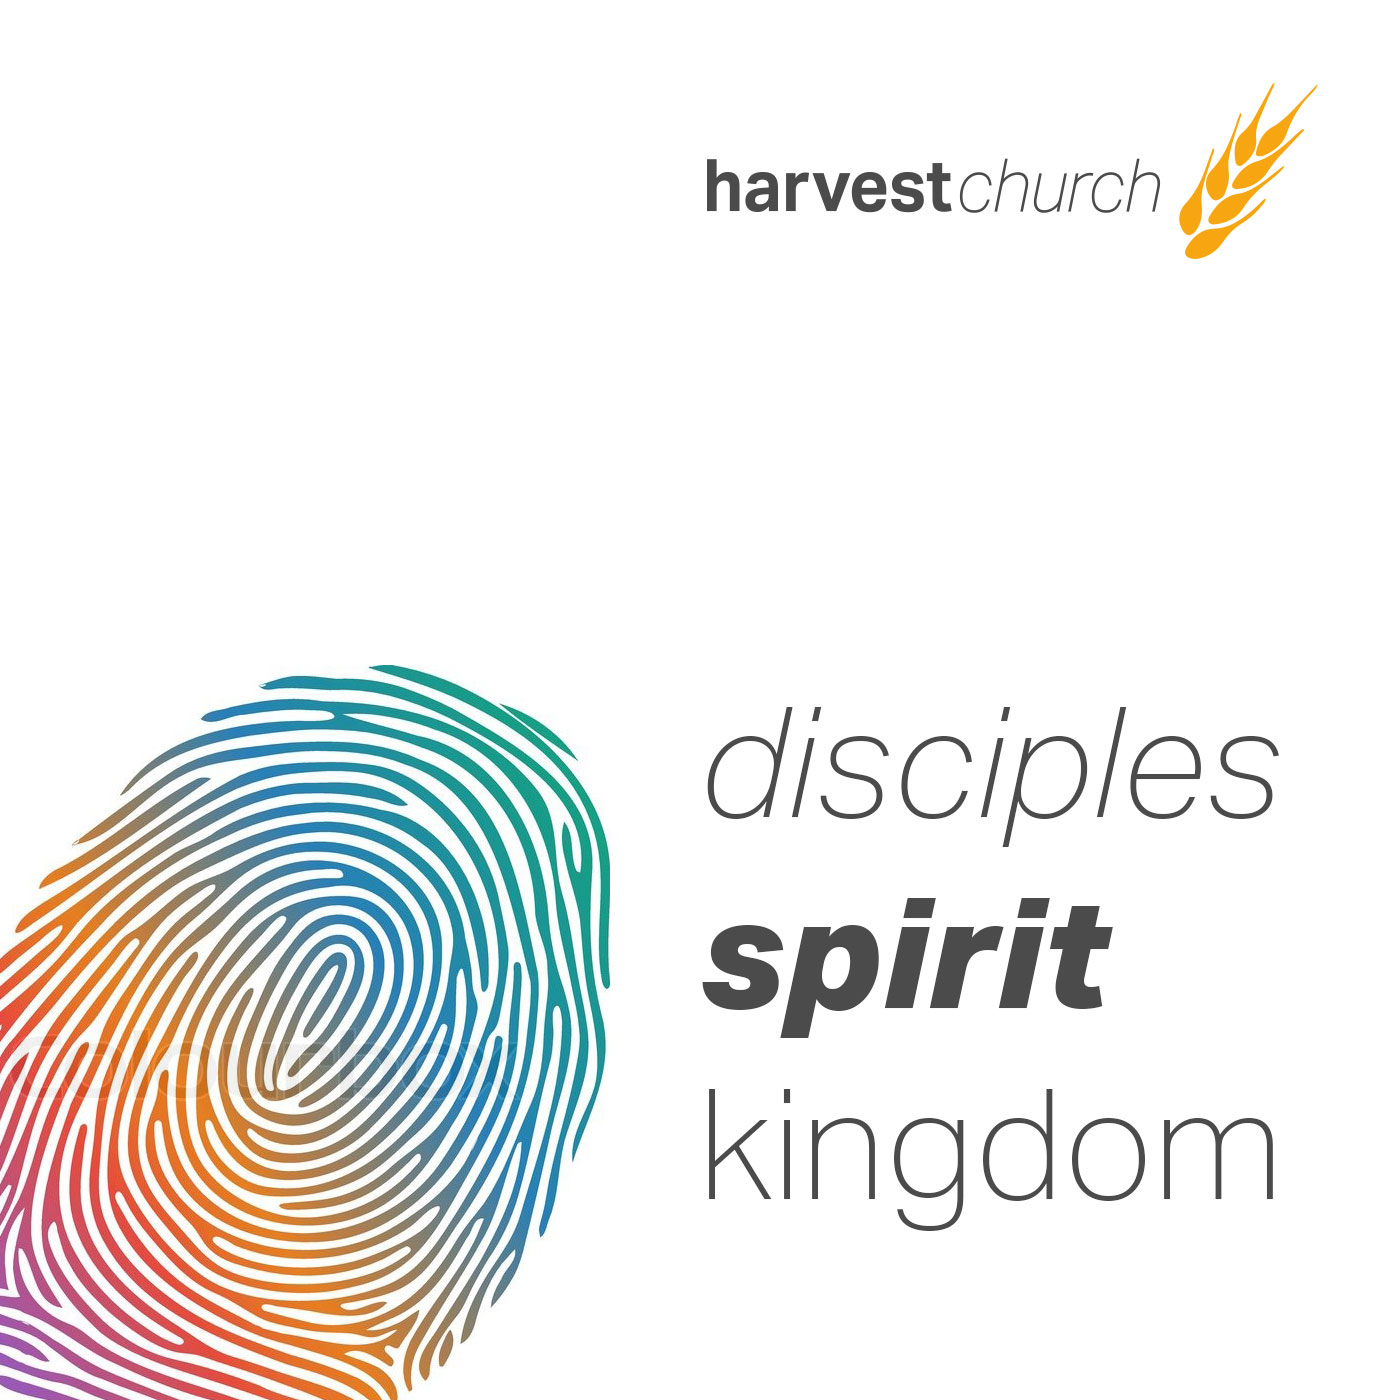 Disciples, Spirit, Kingdom